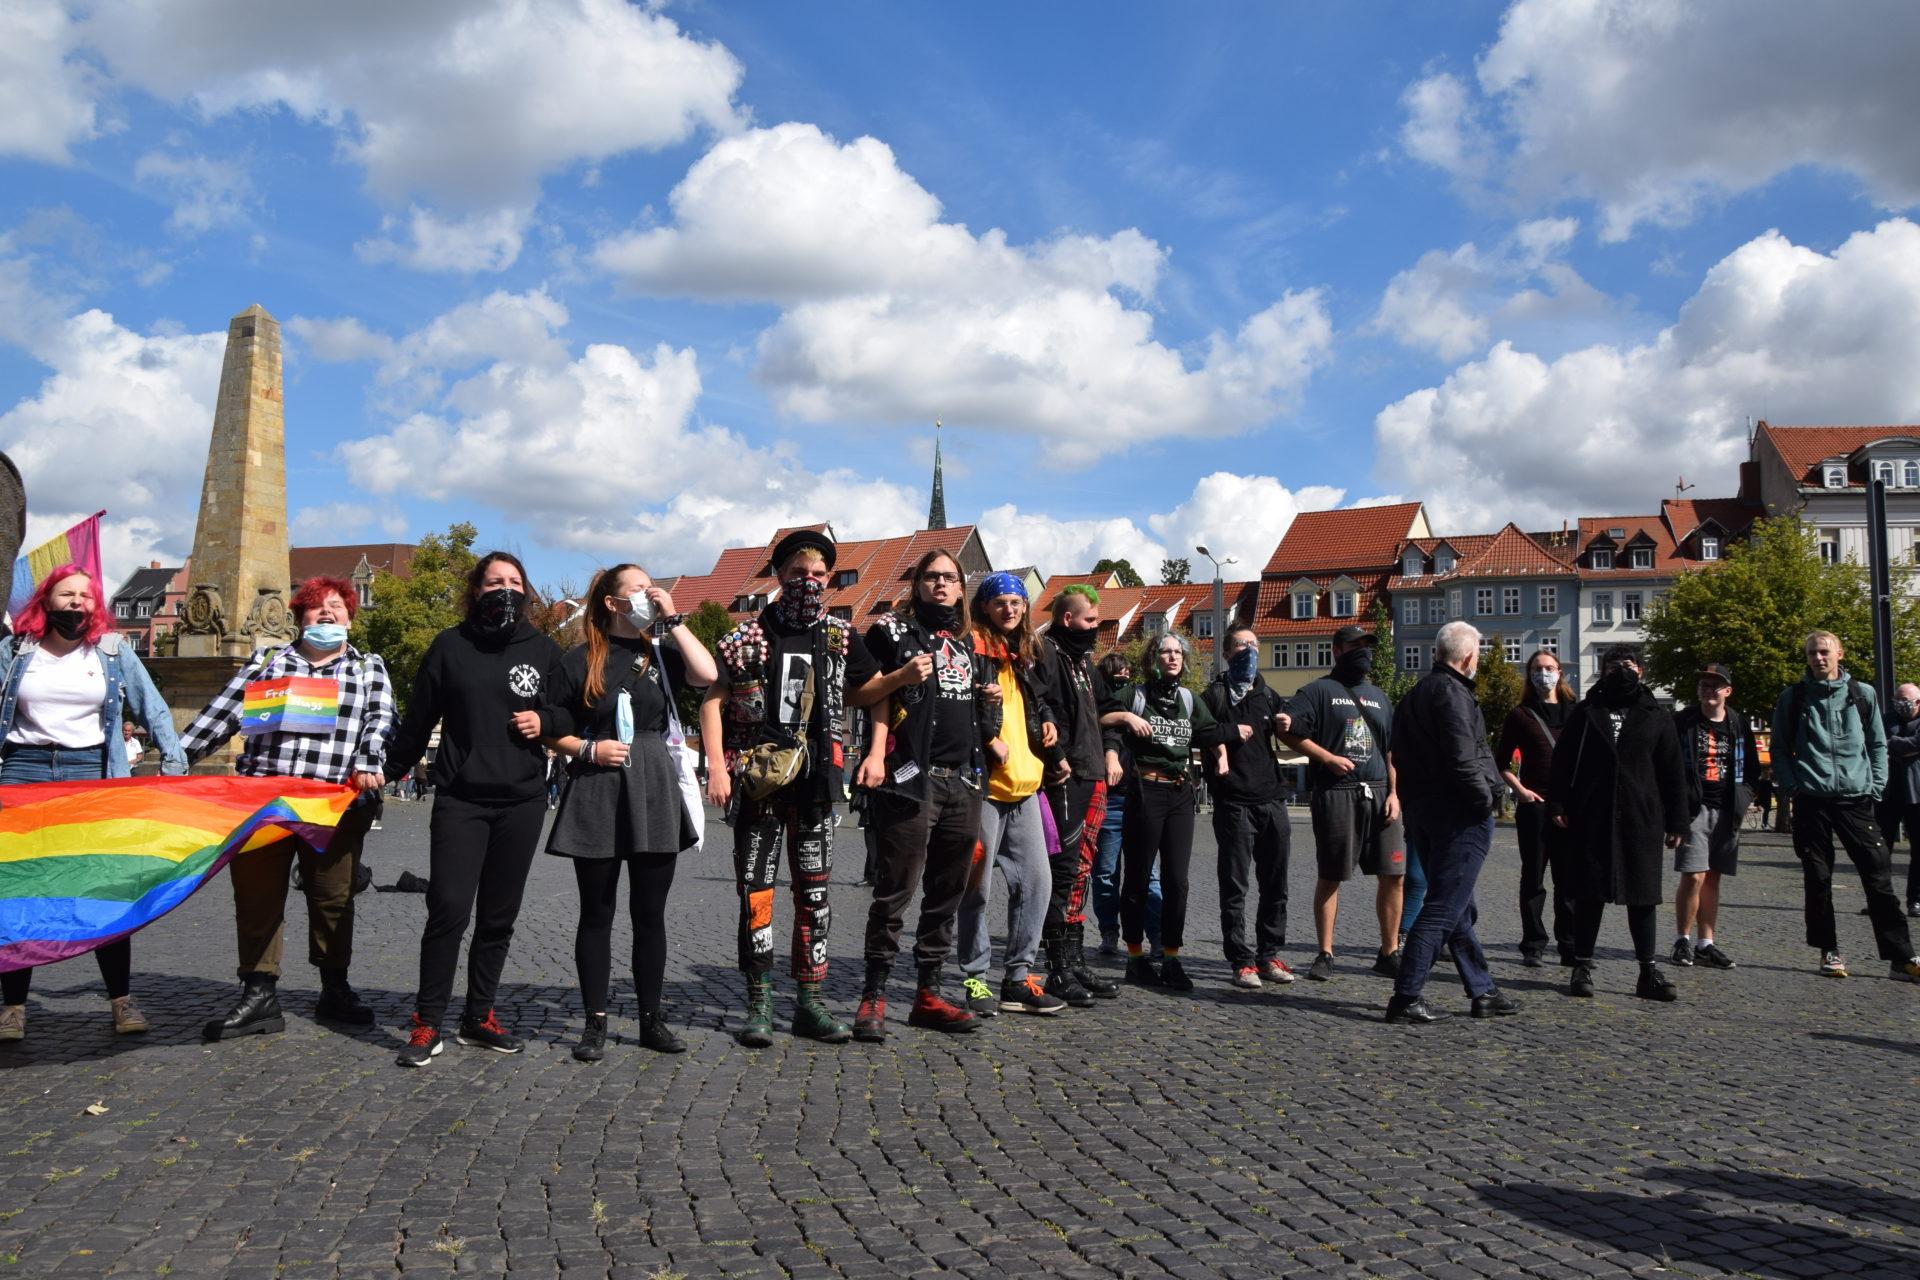 Gegenprotest: Der Bus des Hasses hat Erfurt besucht